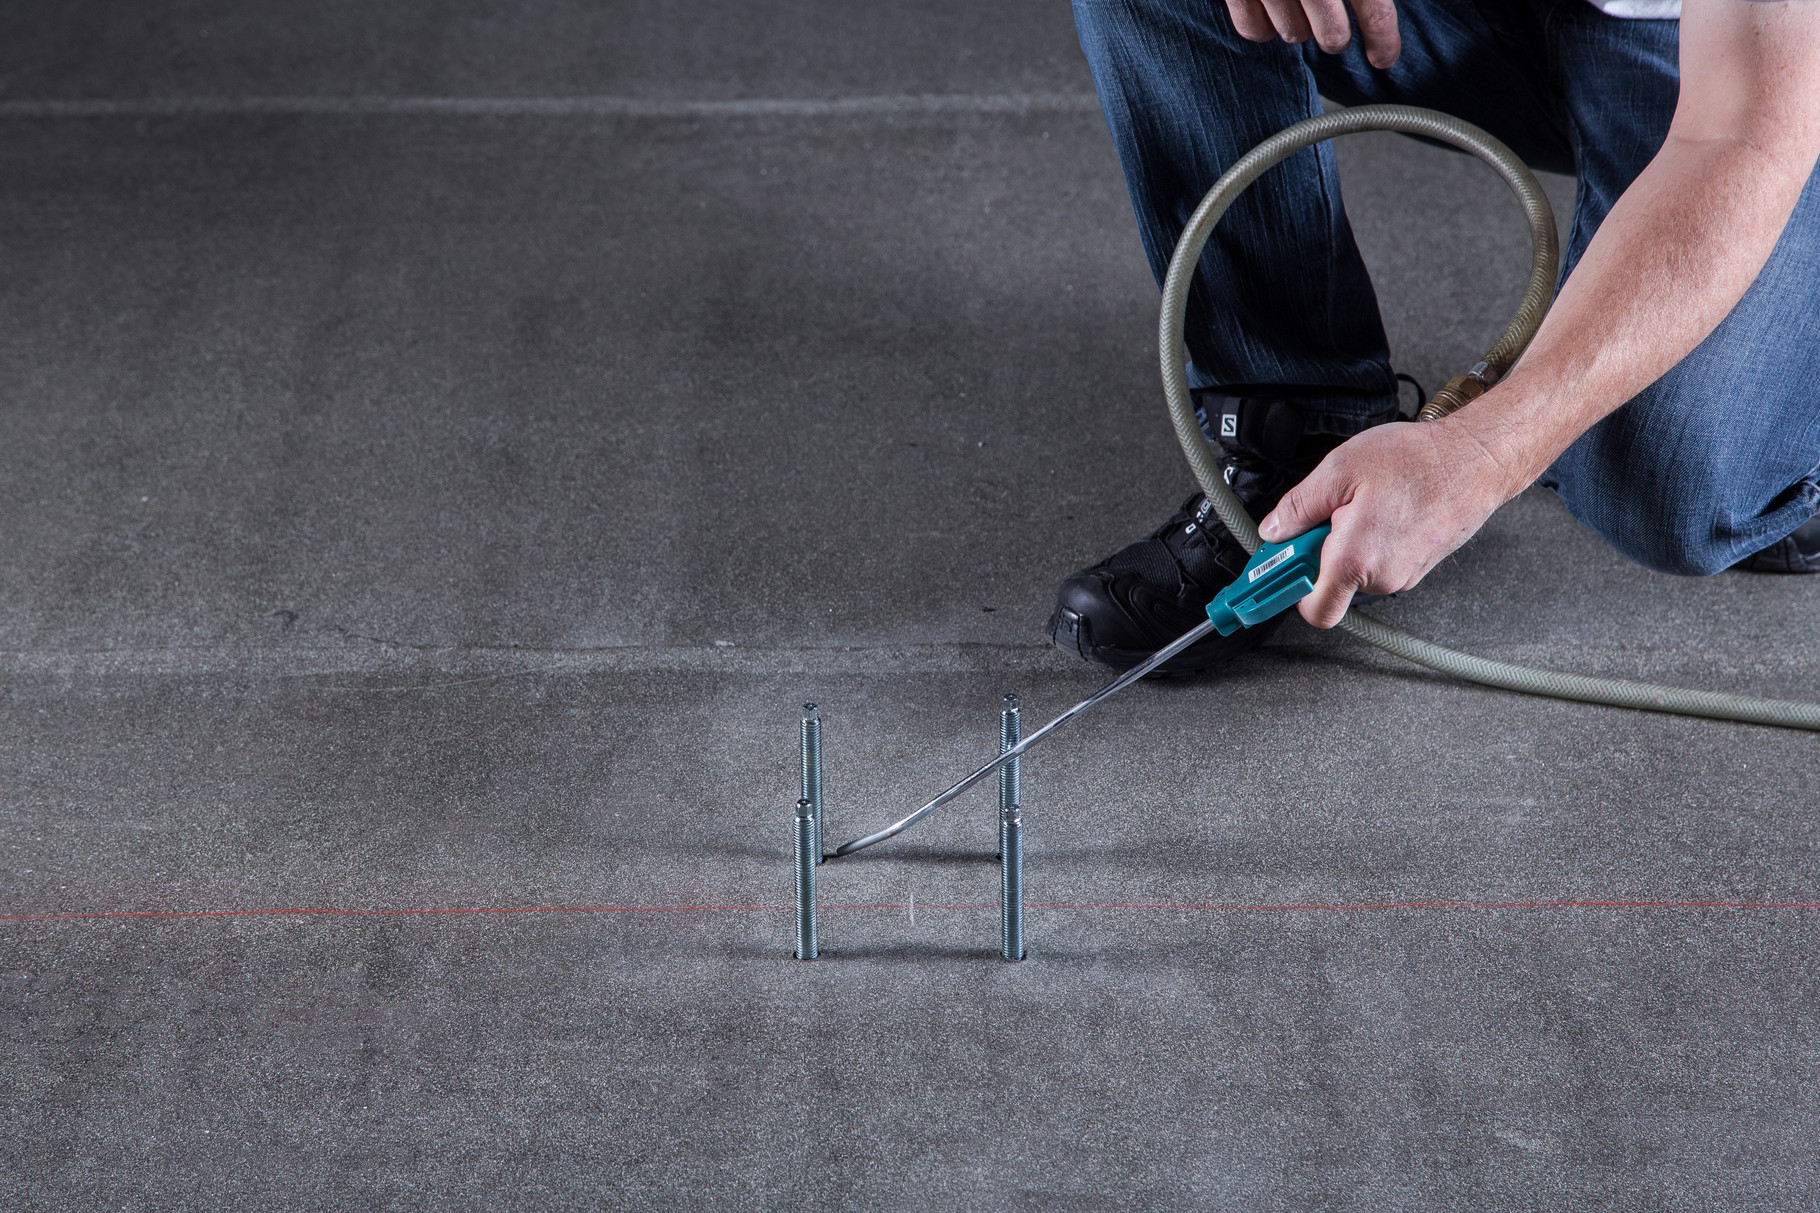 innovative befestigungstechnik beftec dichtes befestigungssystem f r gel nder ganzglas solar. Black Bedroom Furniture Sets. Home Design Ideas